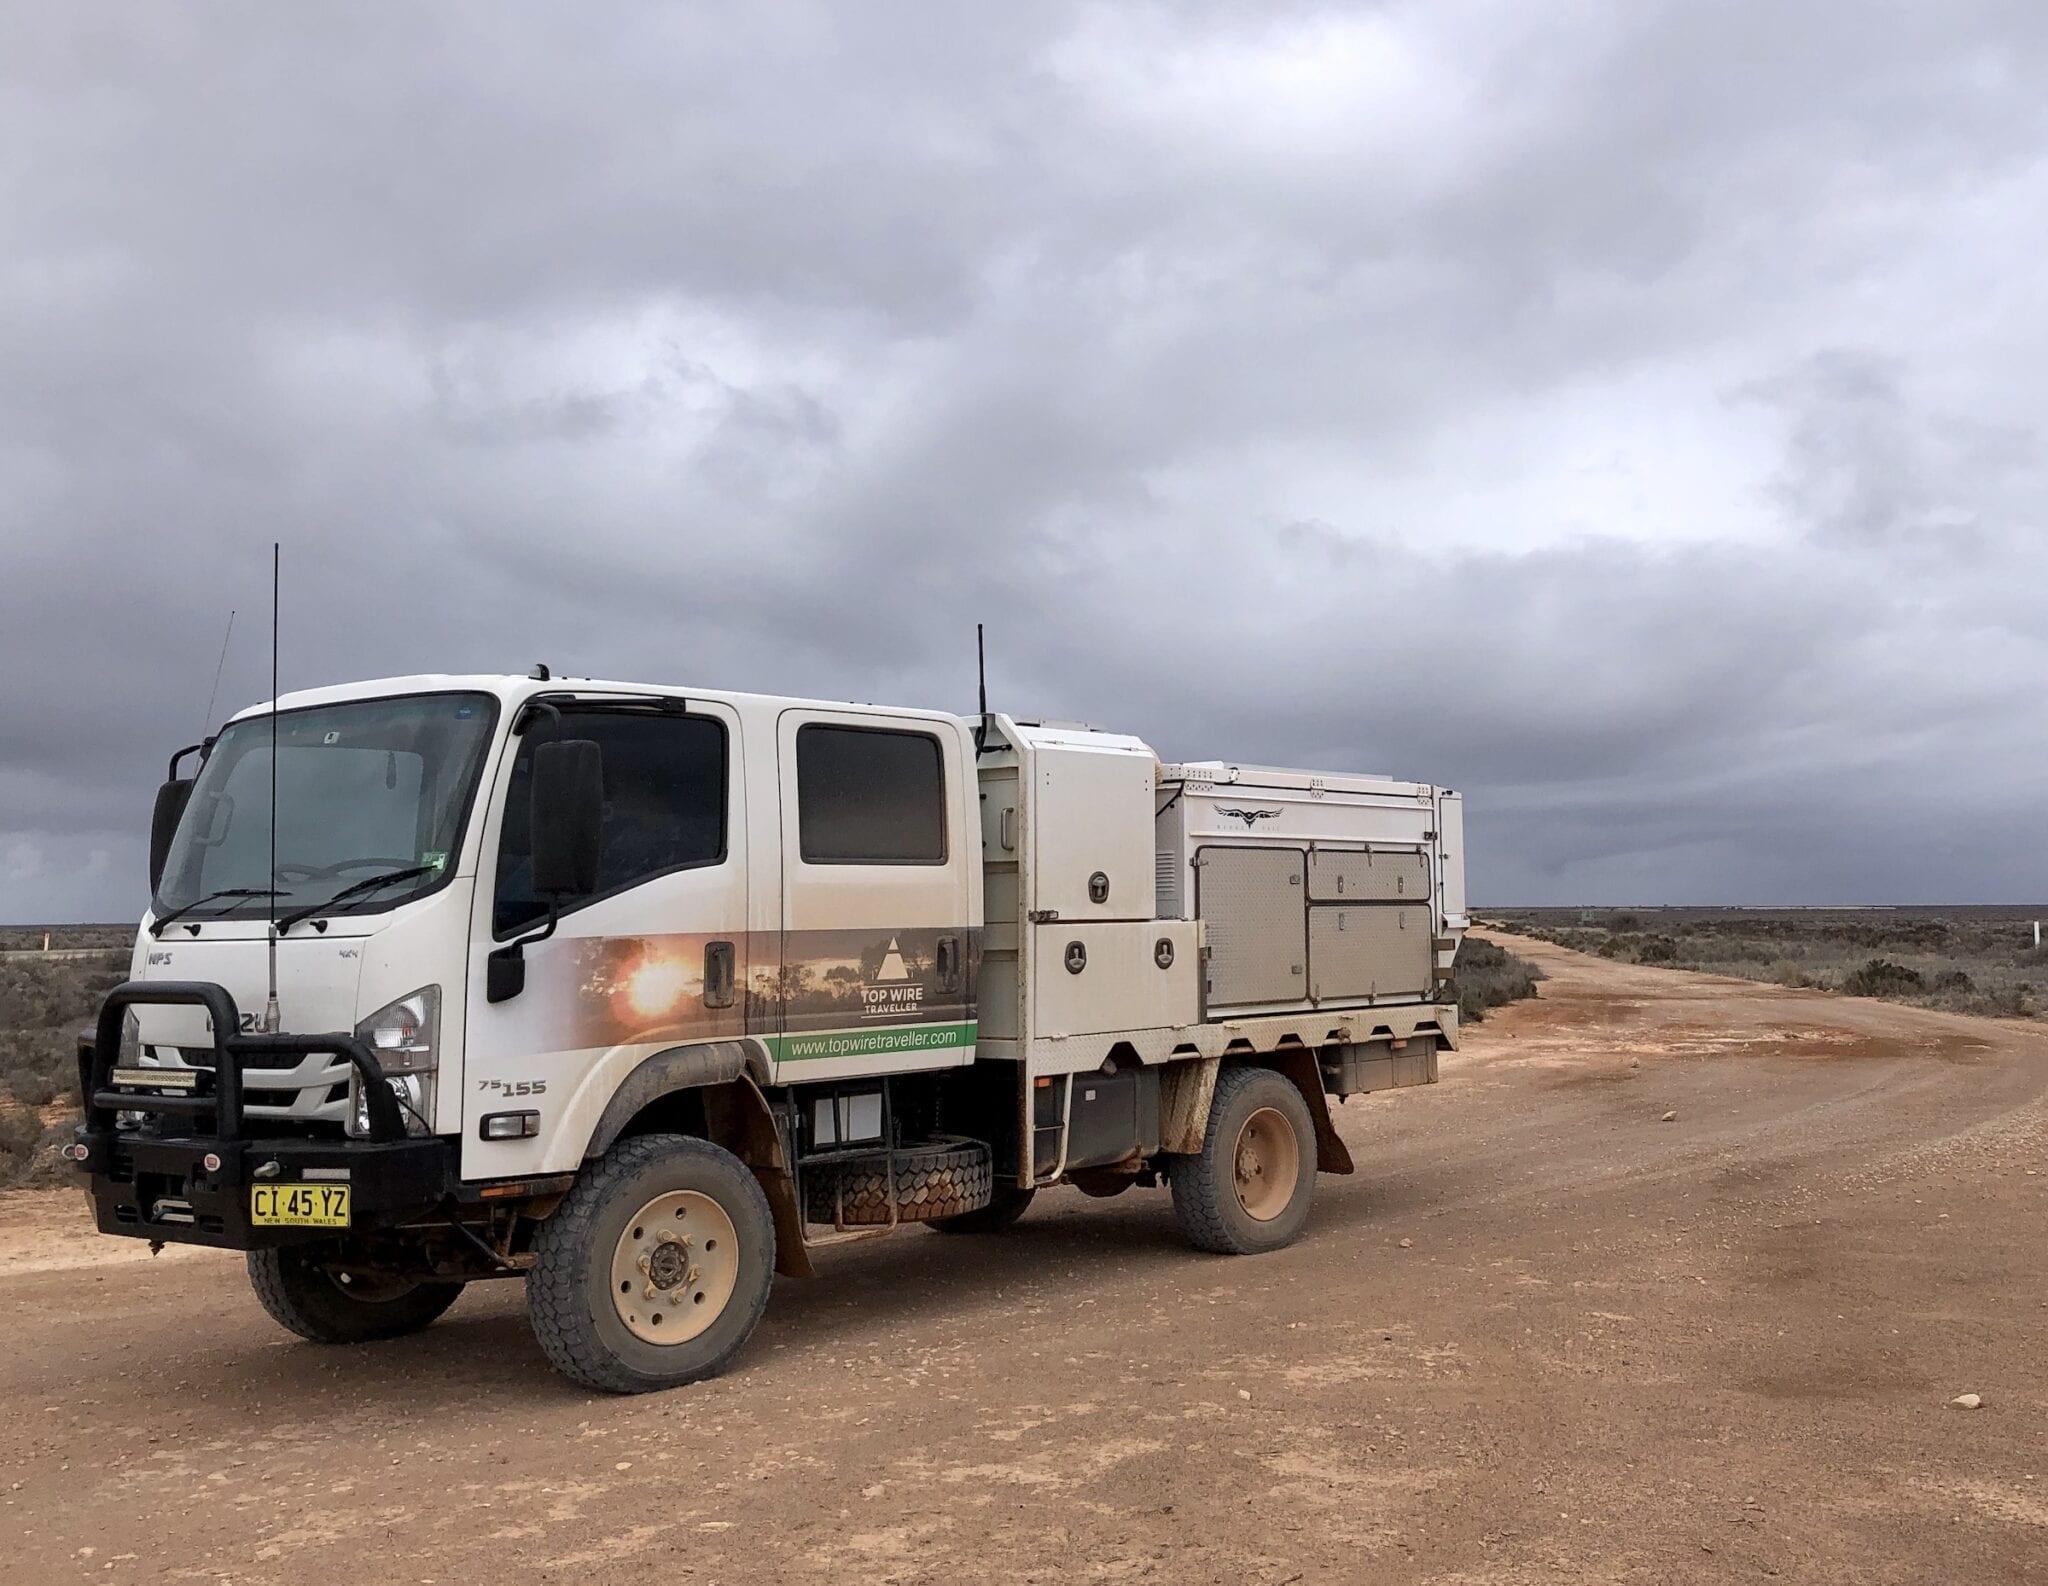 Isuzu 4x4 truck on the Old Eyre Highway, Nullarbor Plain South Australia.